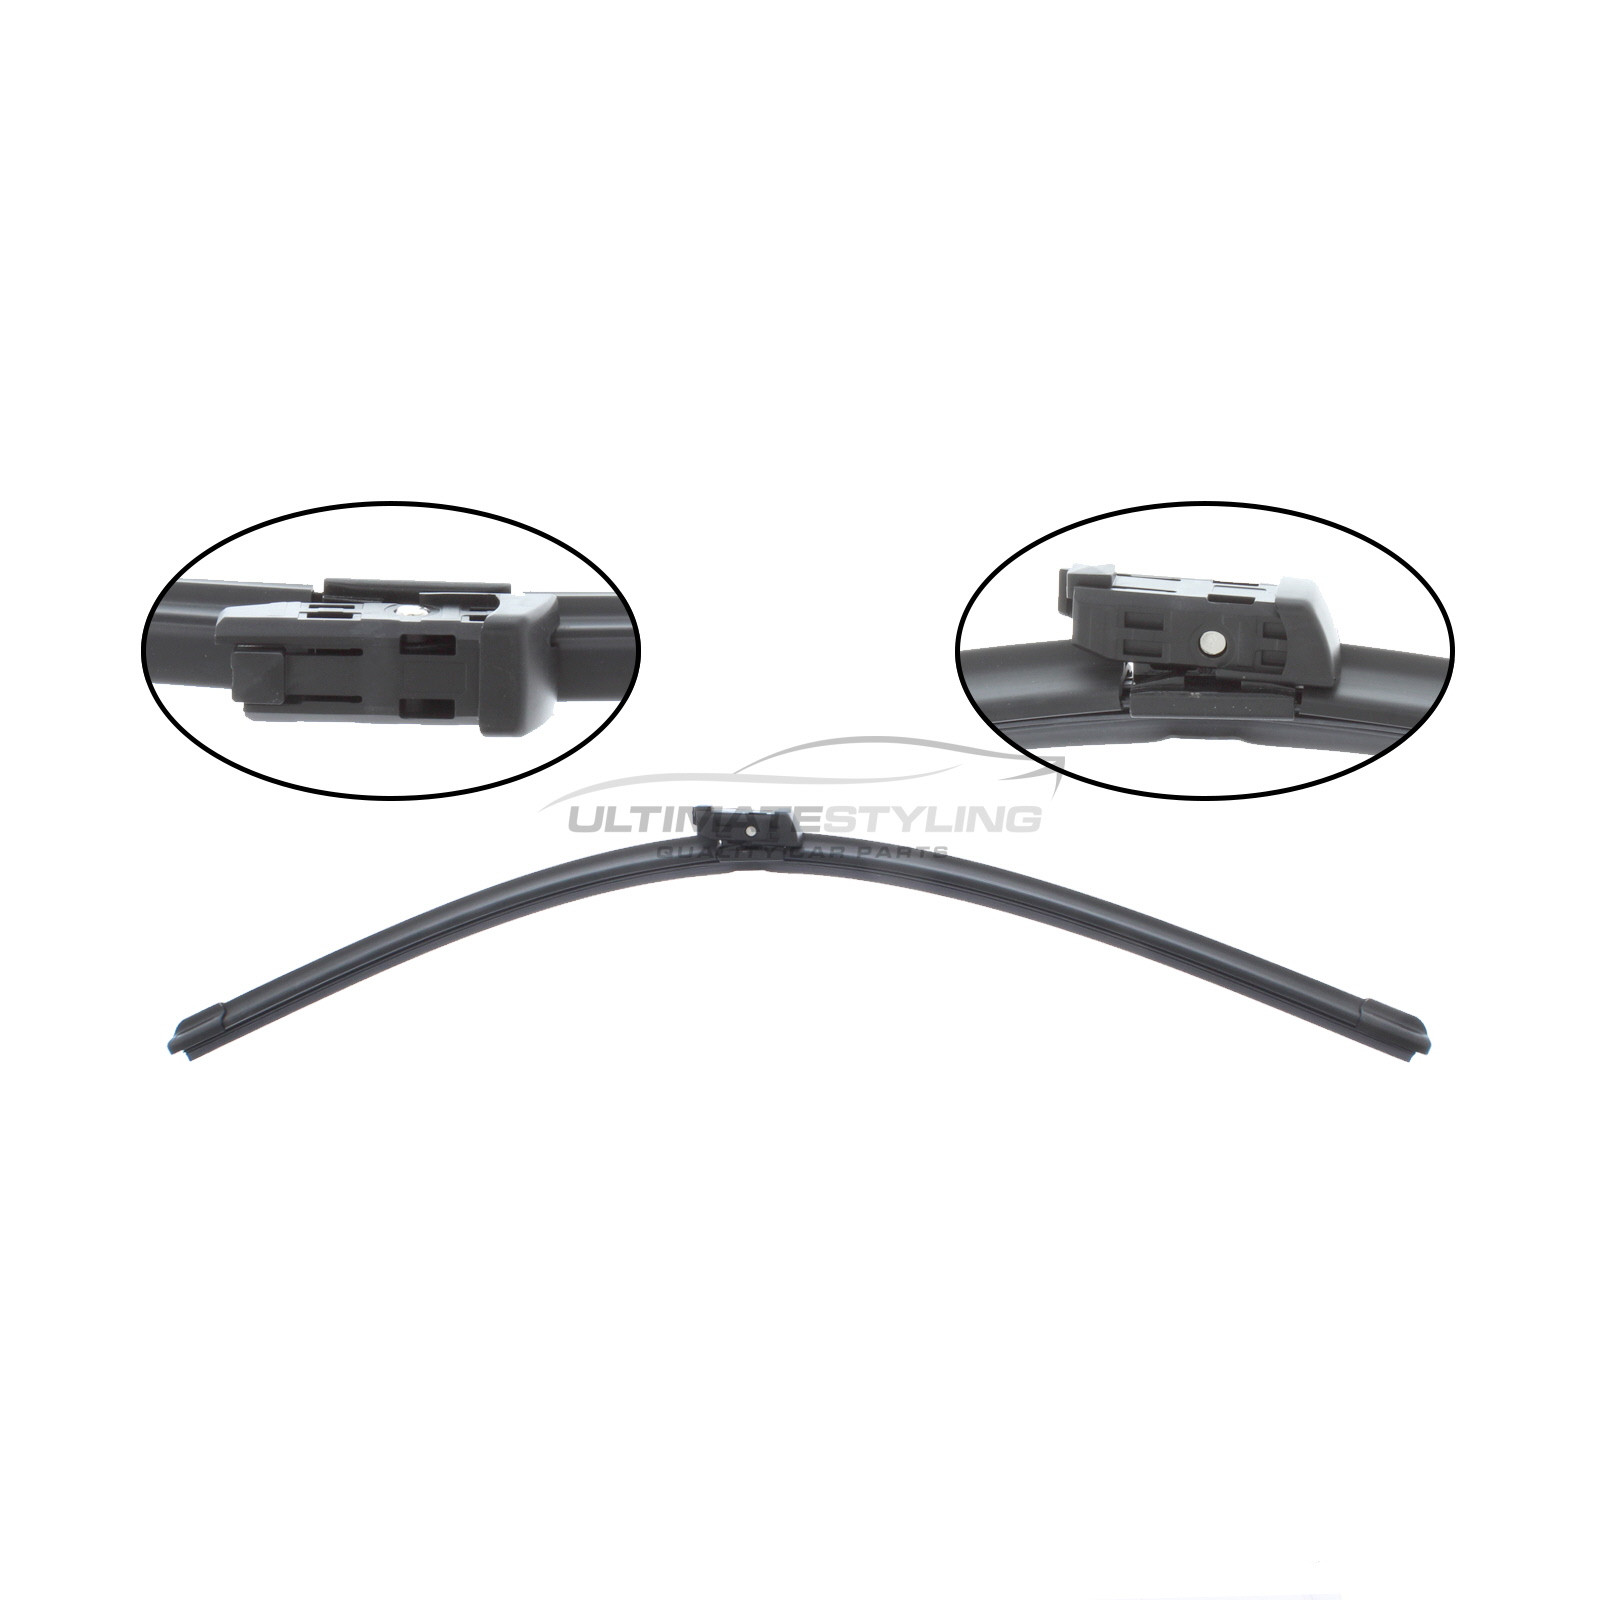 Wiper Blade - Exact Fit Aero Blade - 60 cm - 24 inch - Multi Fitment